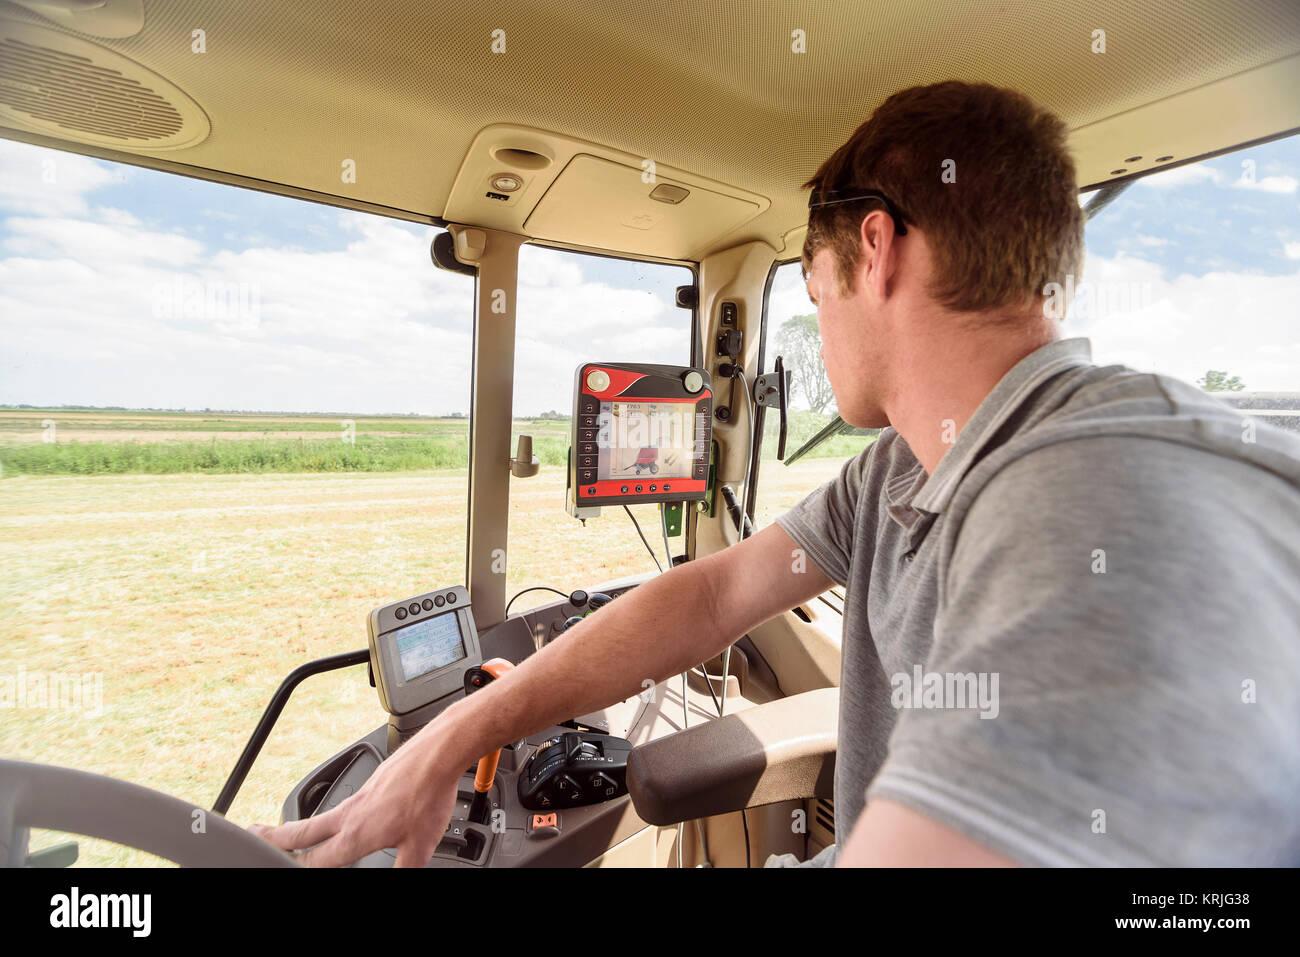 Caucasian man driving tractor on farm - Stock Image